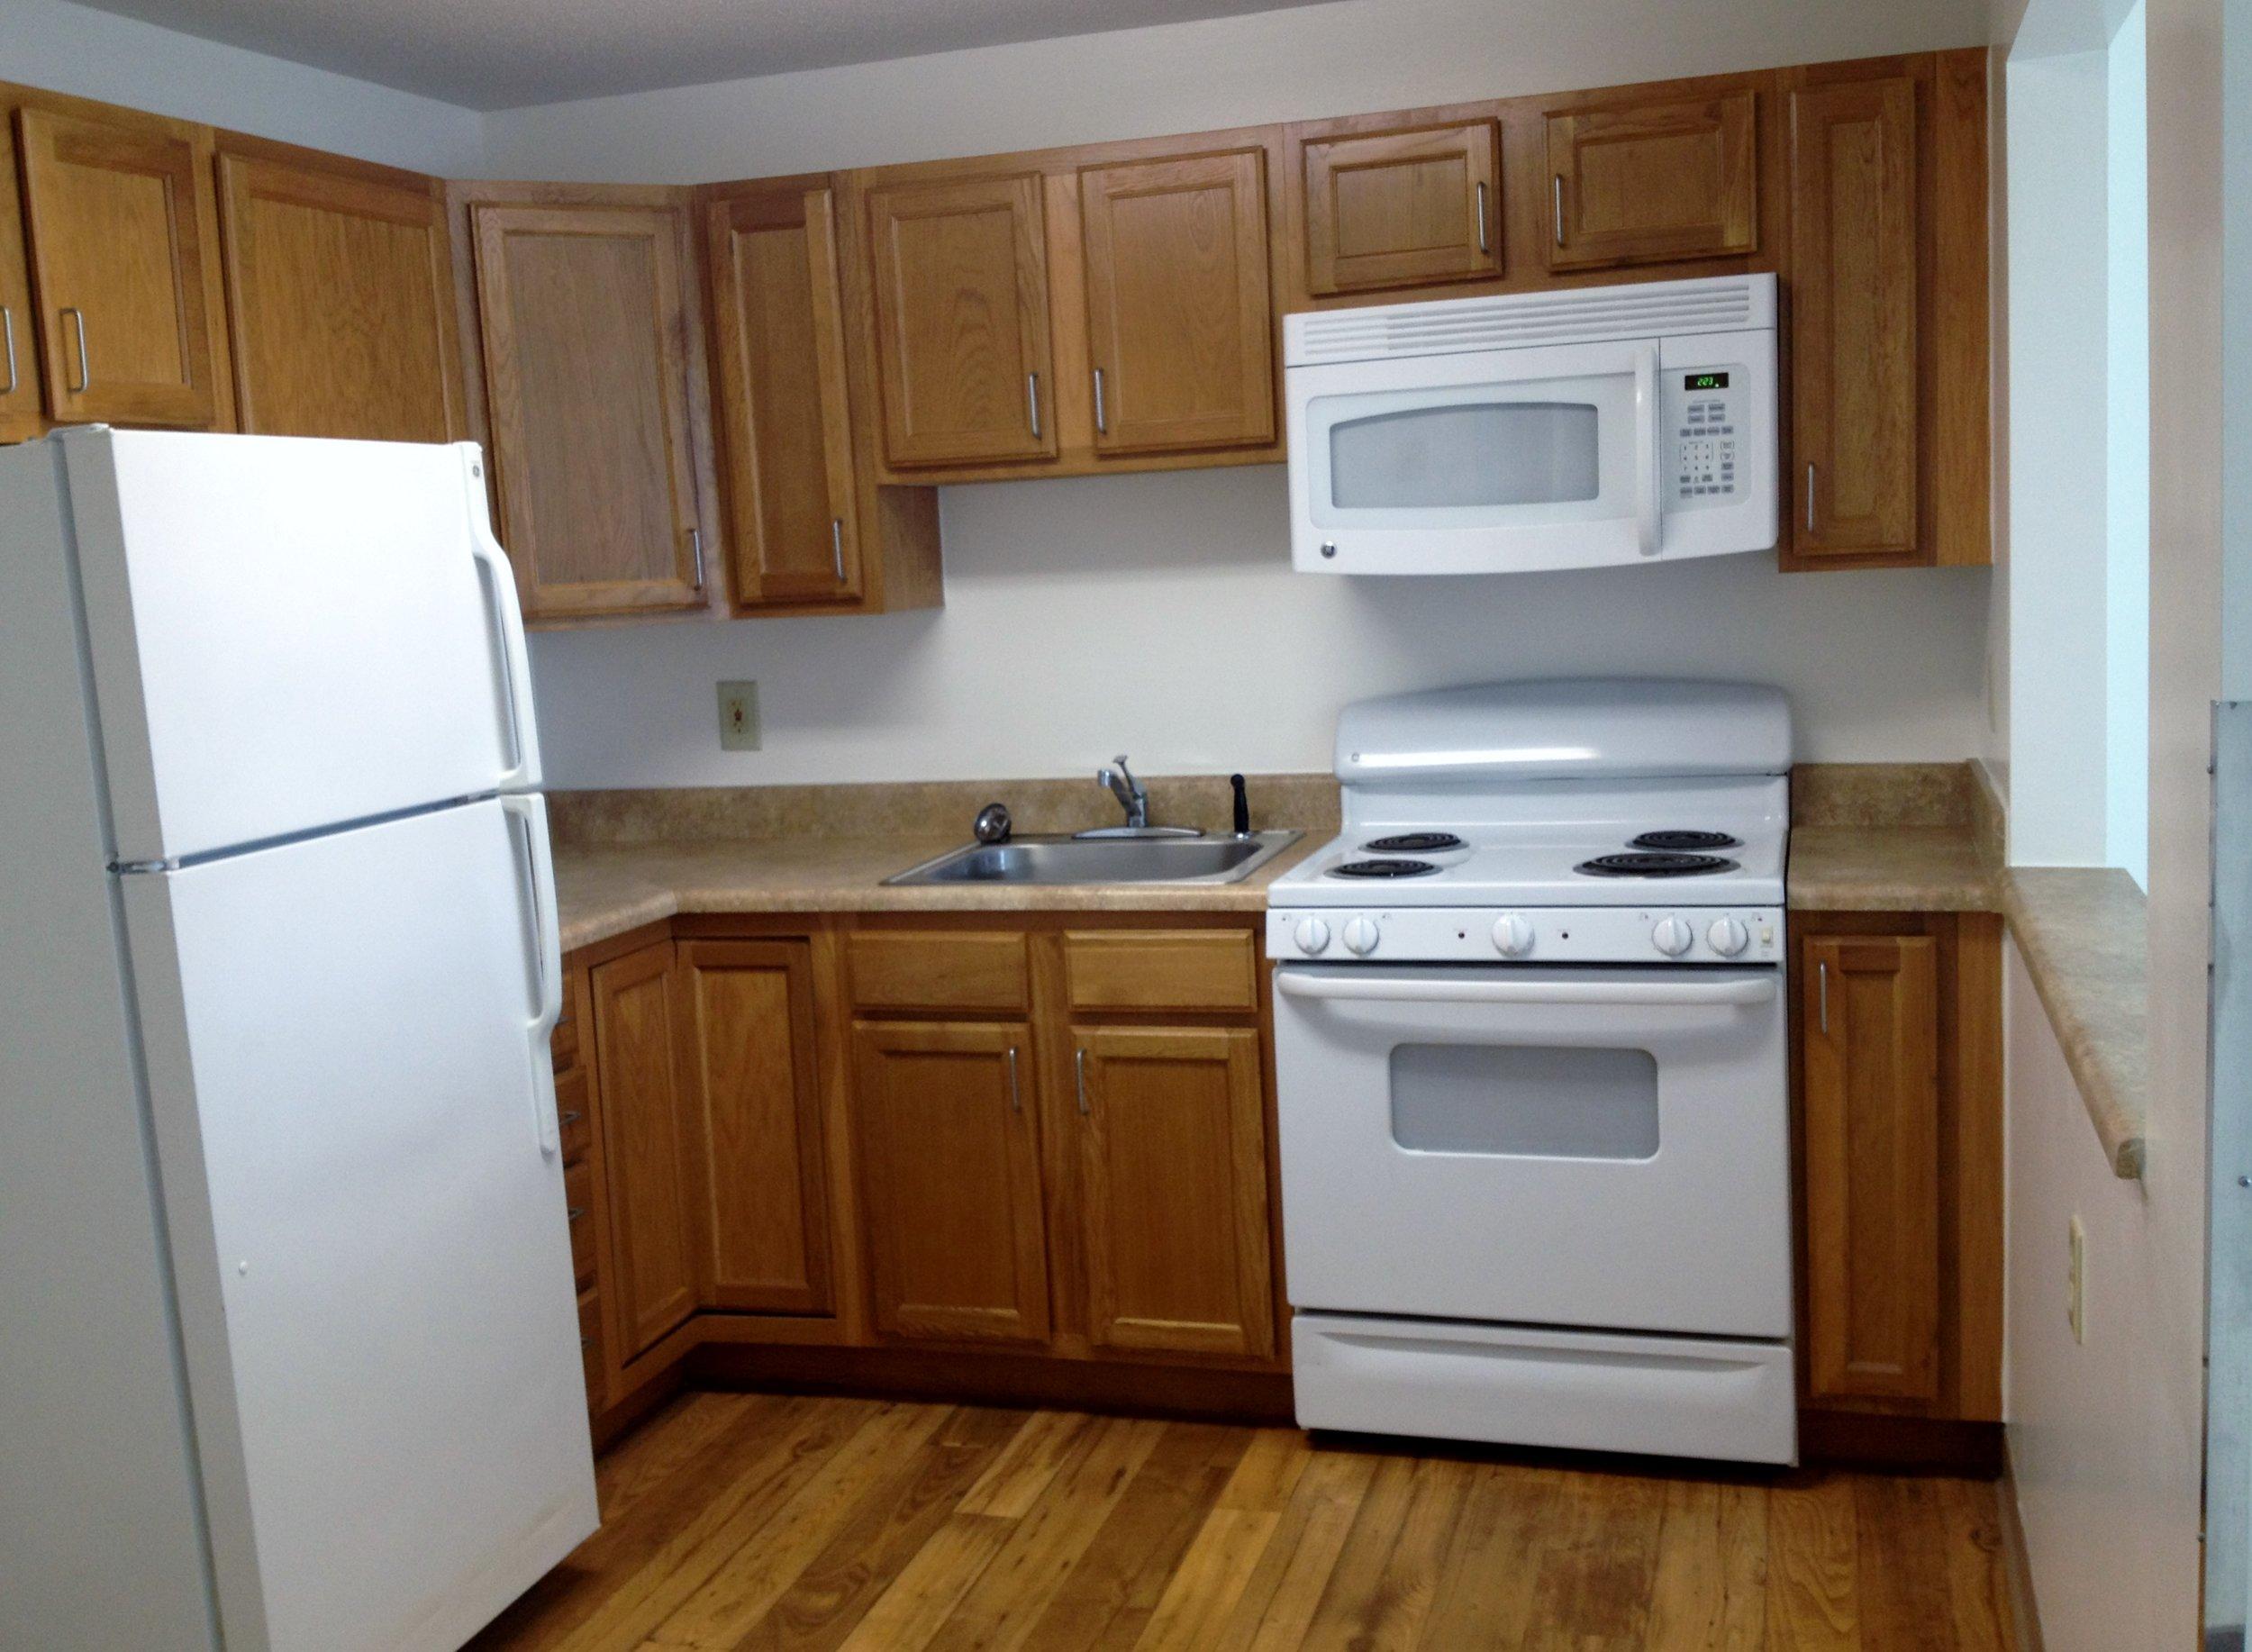 9-Unit kitchen.JPG